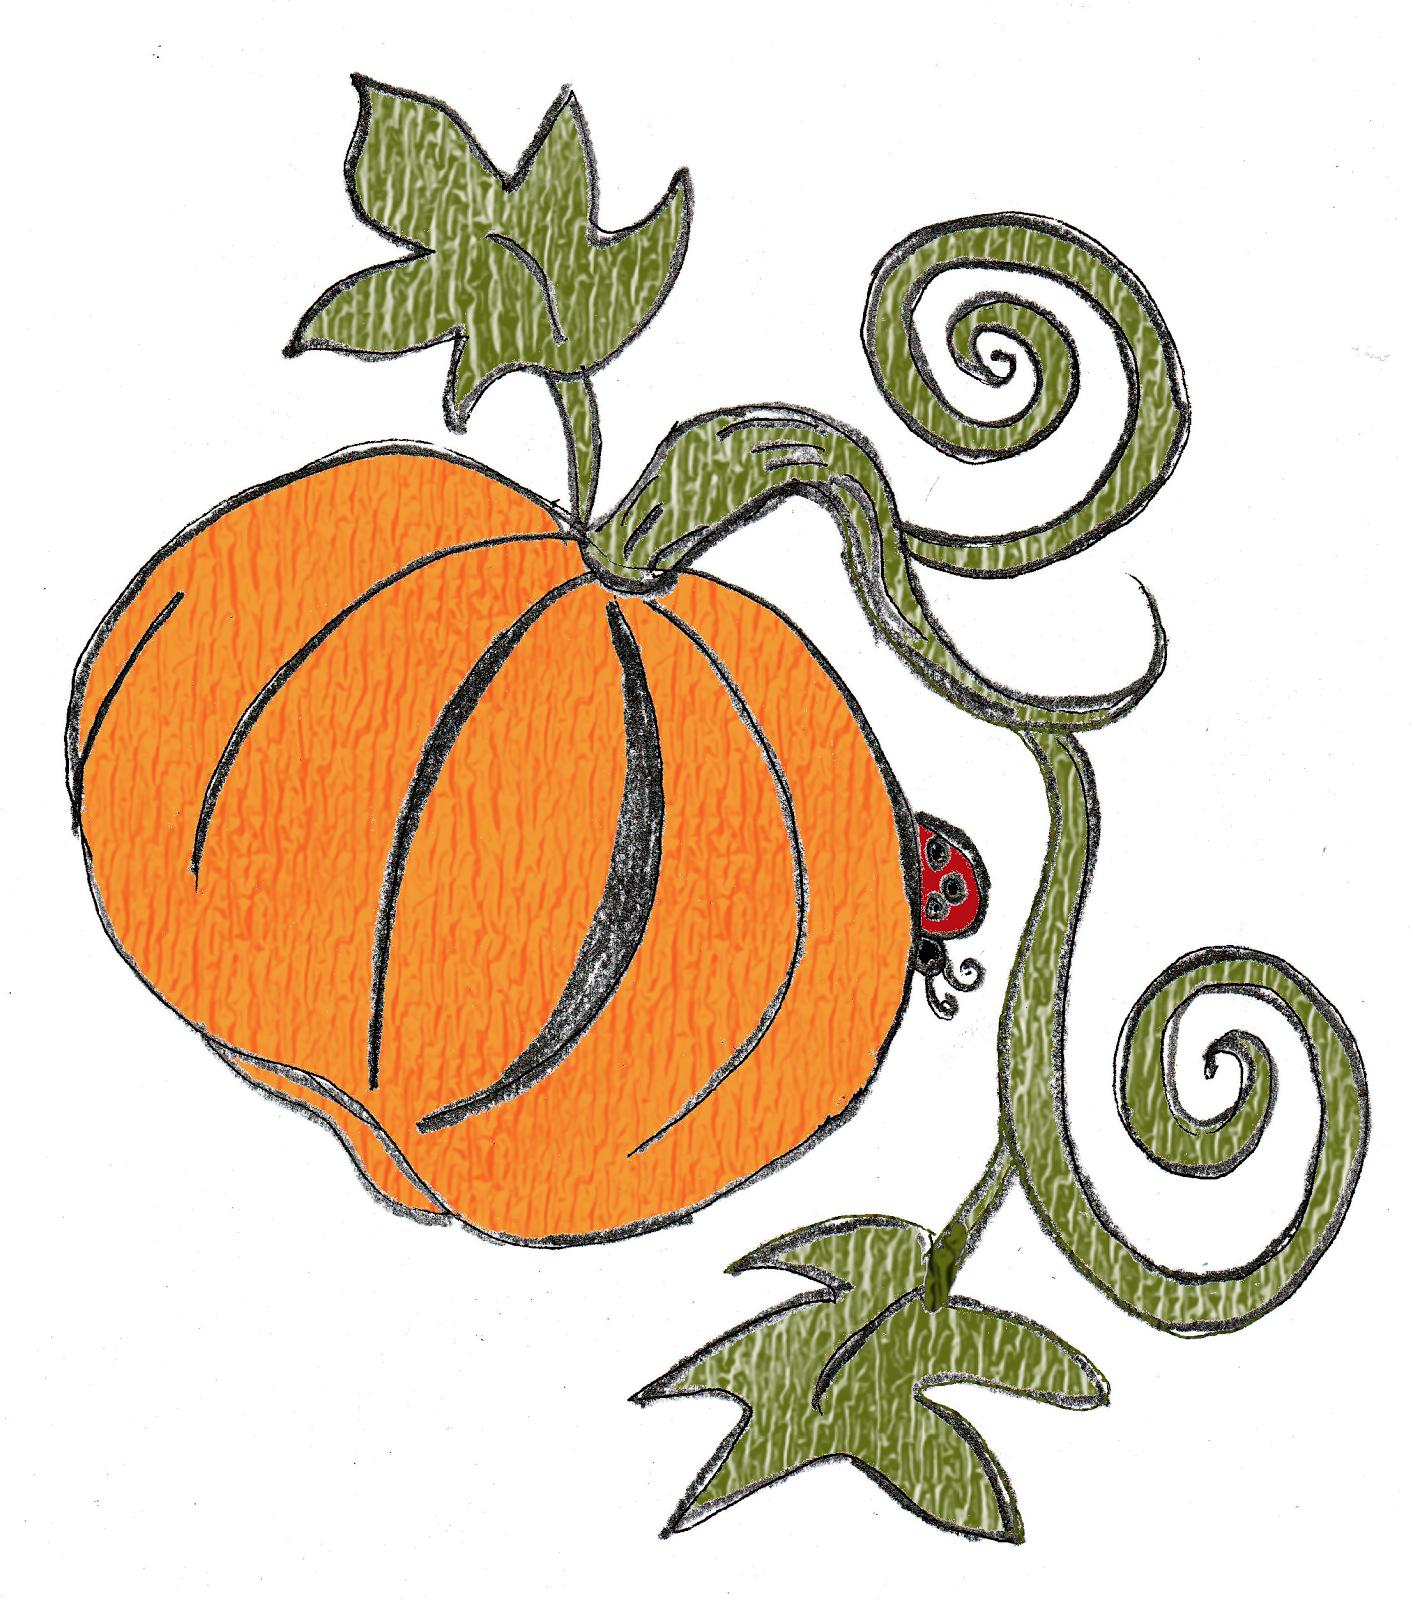 Drawn pumpkin vine And large pumpkin bug the